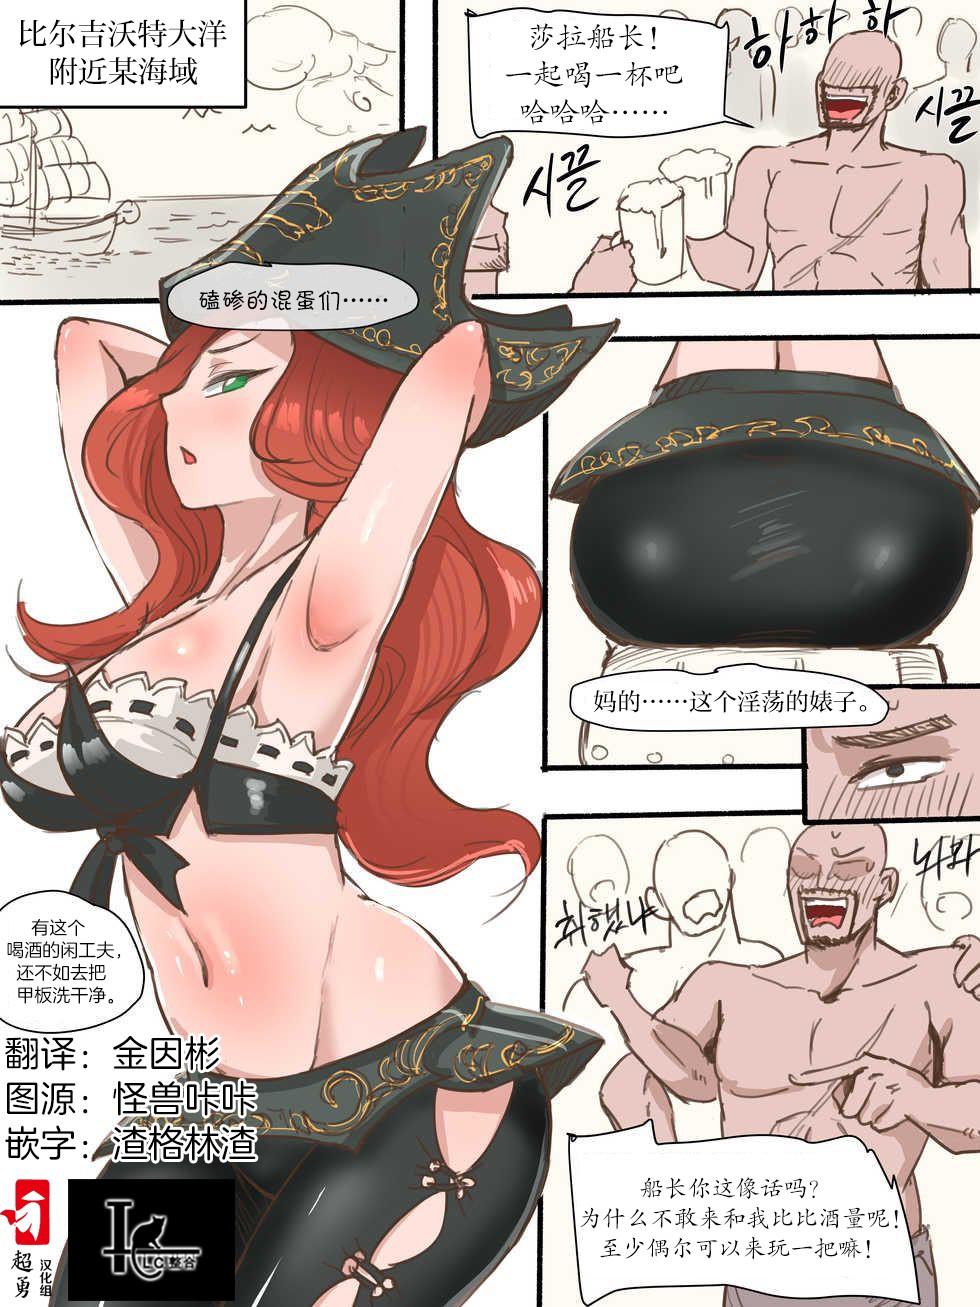 [CN - DOUJIN] Laliberte ~ 好孕姐的海盗酒量比赛(英雄联盟) Hentai